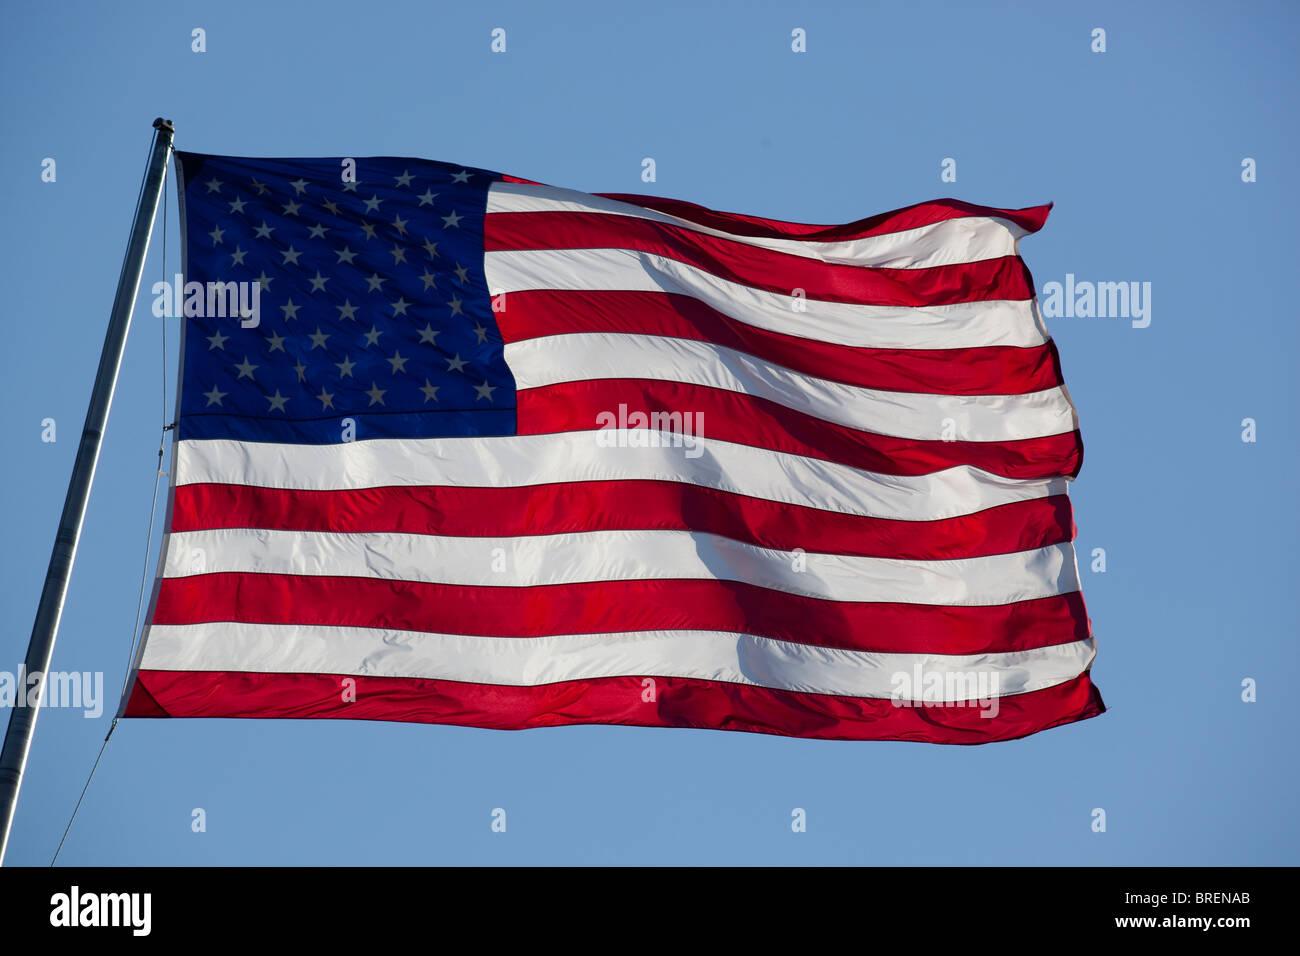 American Flag - Stock Image